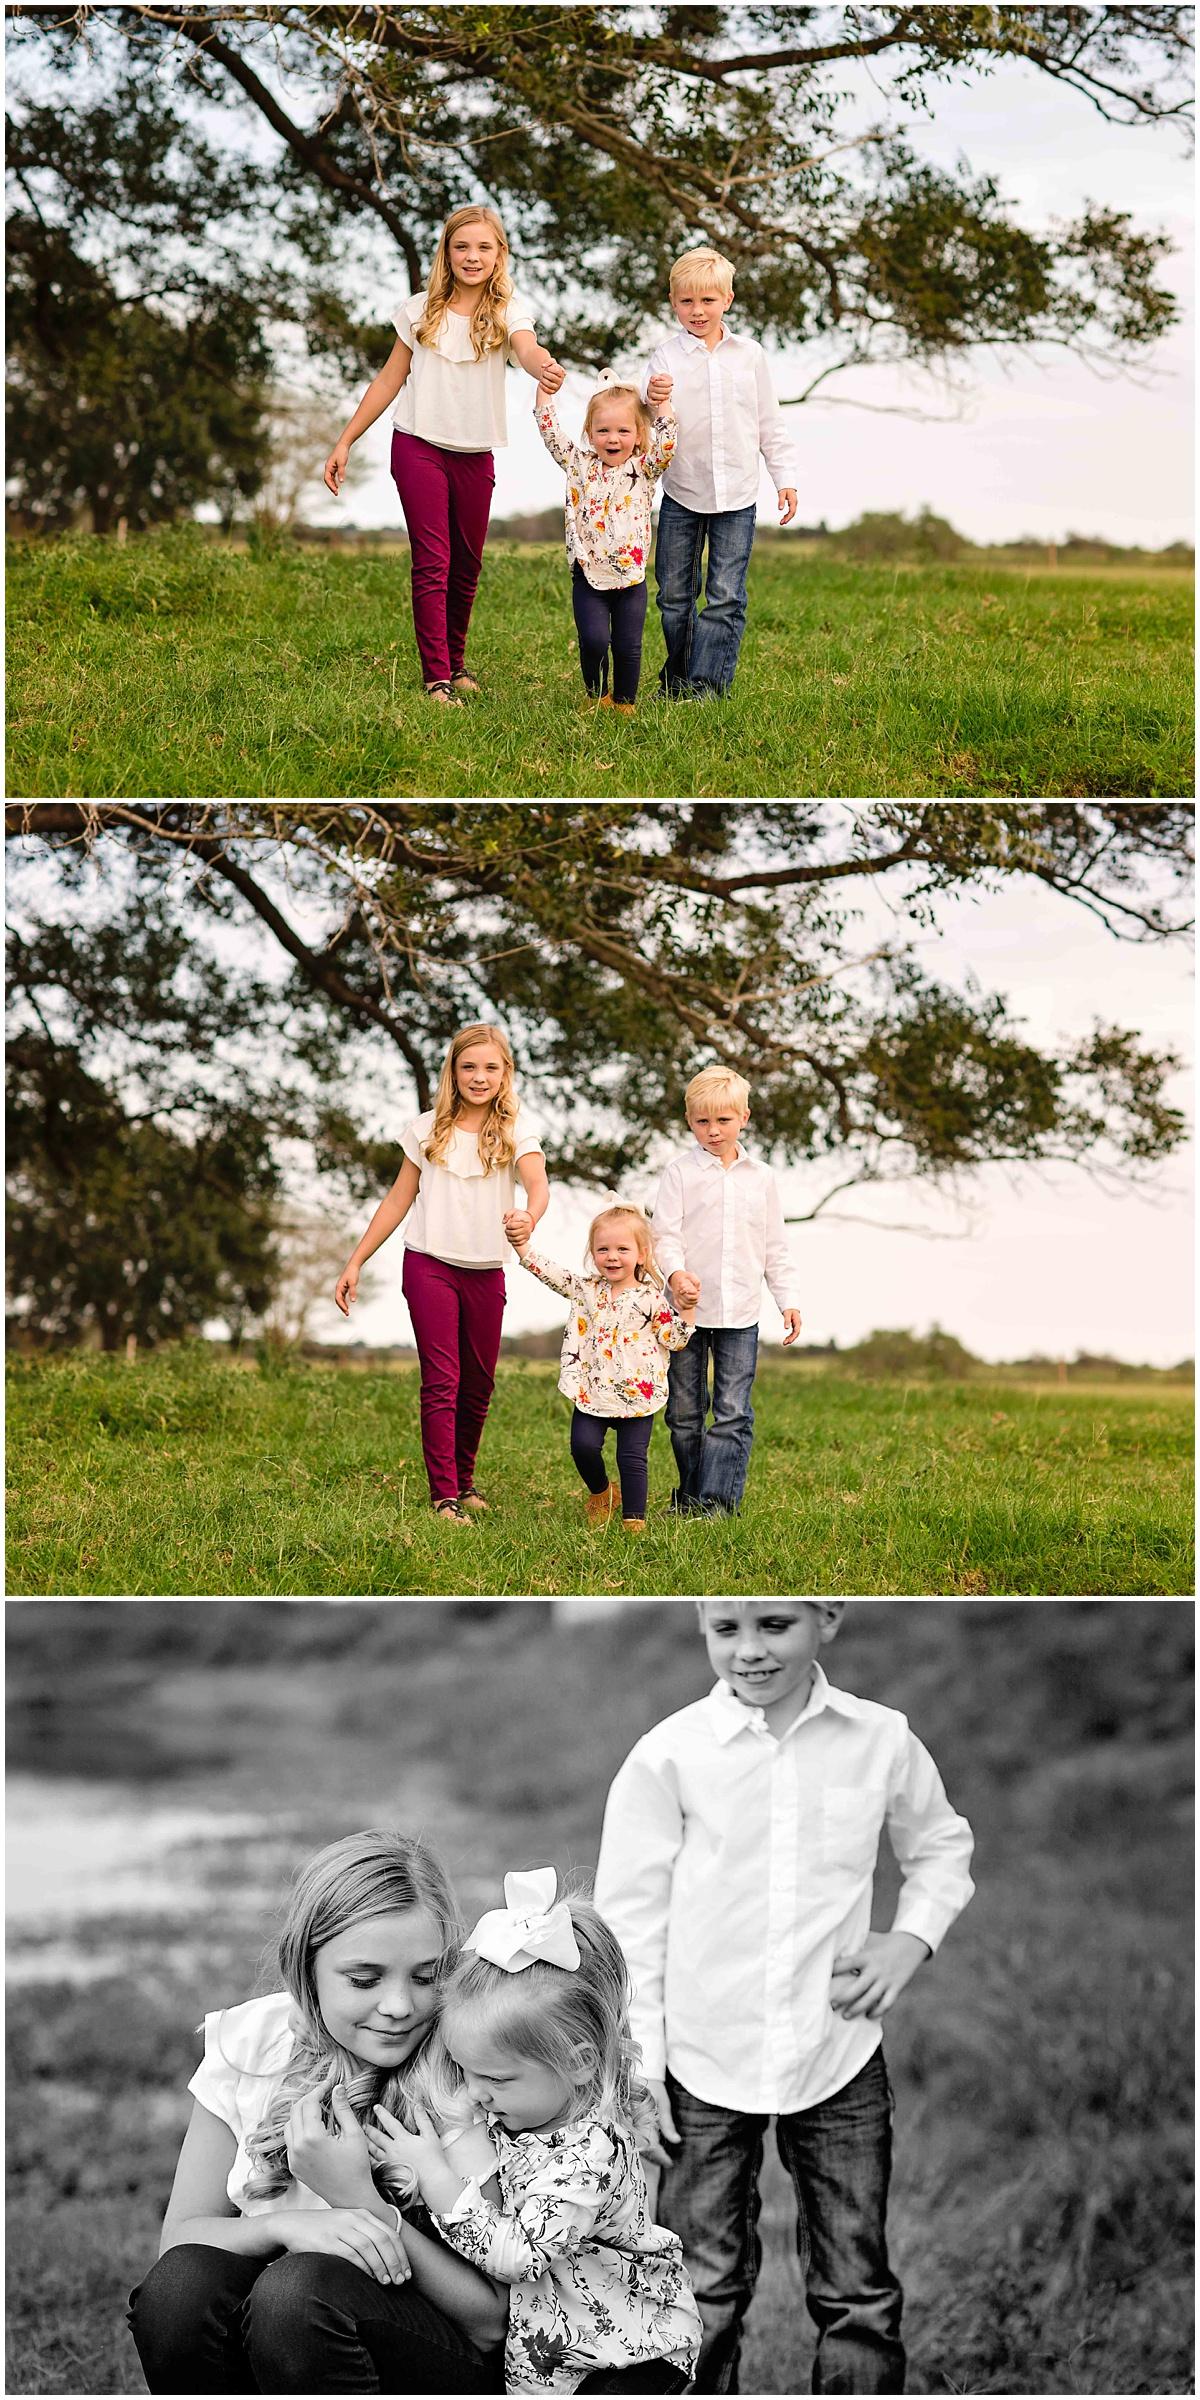 Family-Children-Maternity-Portraits-San-Antonio-Hill-Country-Texas-Carly-Barton-Photography_0030.jpg